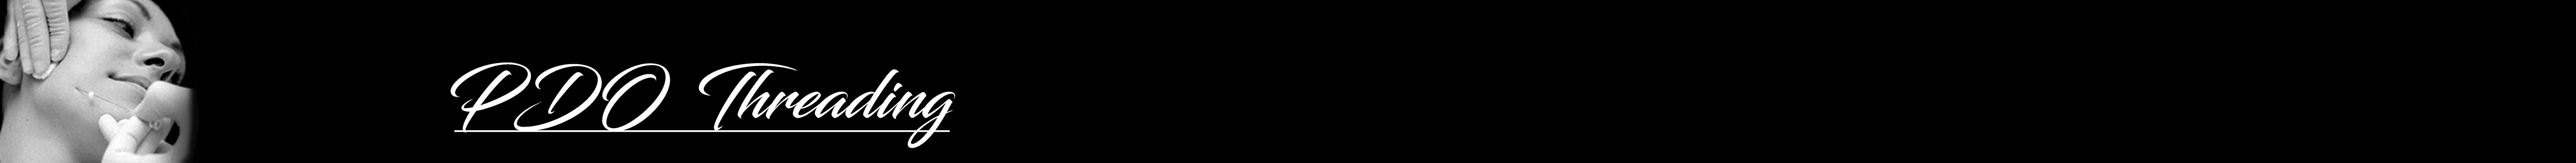 pdobanner